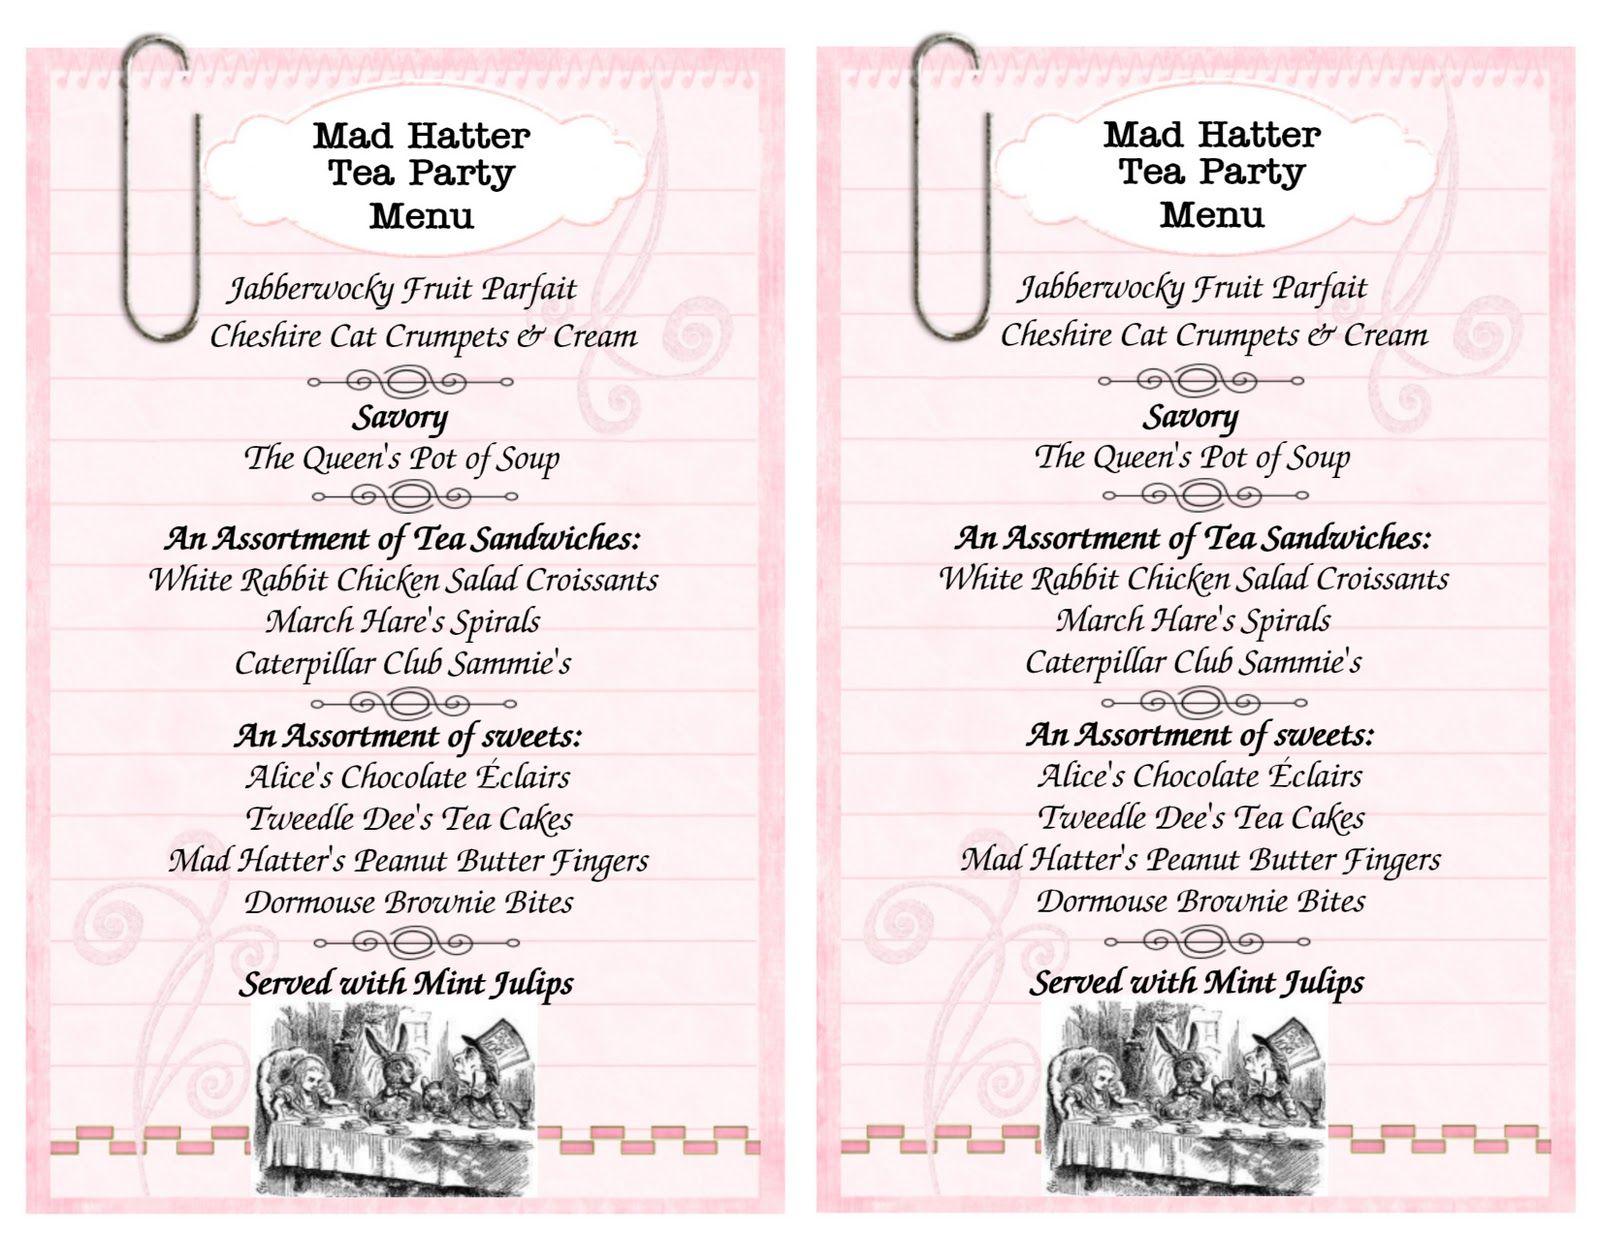 mad hatter tea party menu sample Birthday Ideas Pinterest